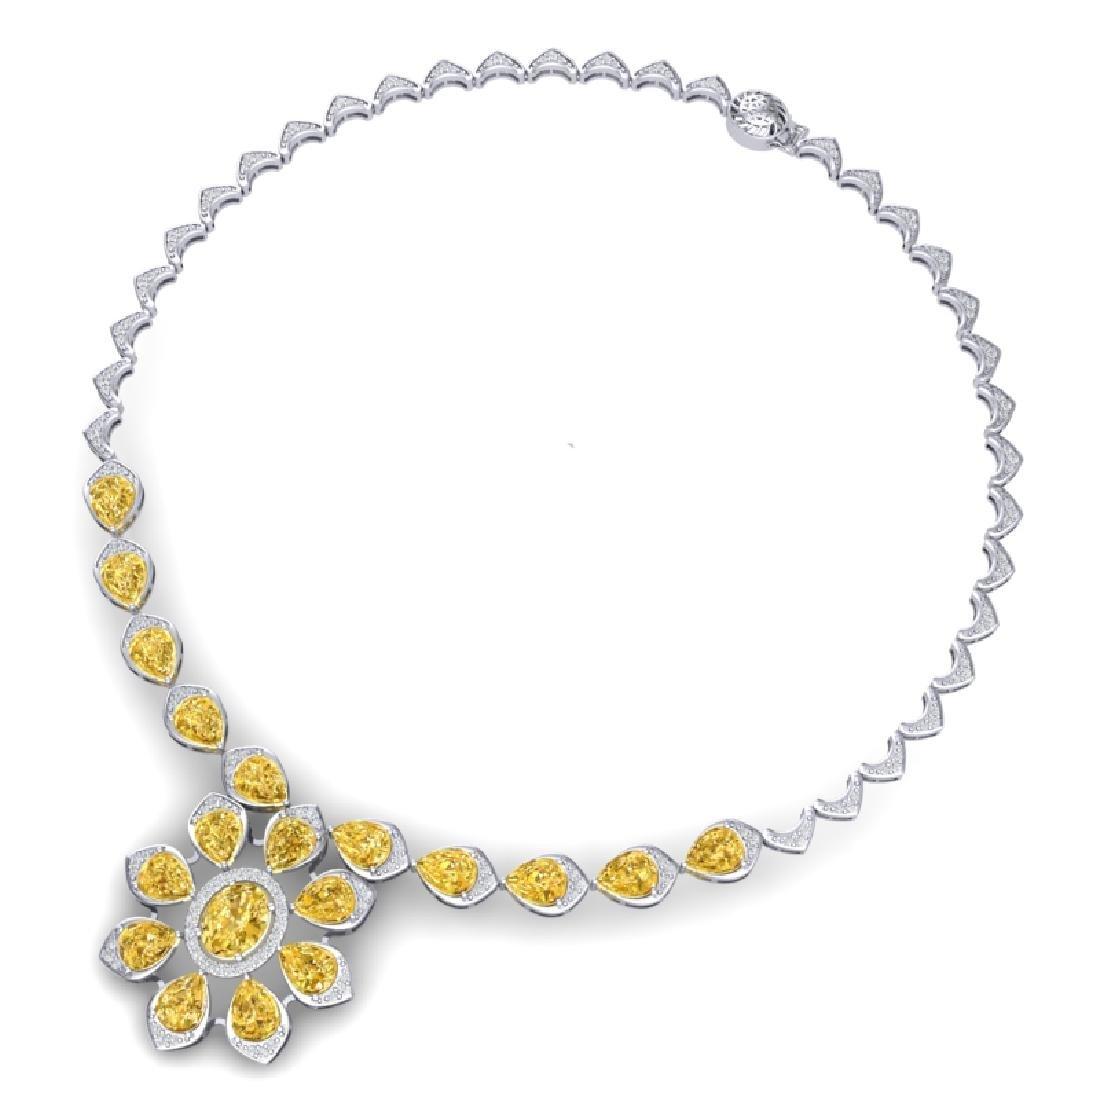 28.51 CTW Royalty Canary Citrine & VS Diamond Necklace - 3